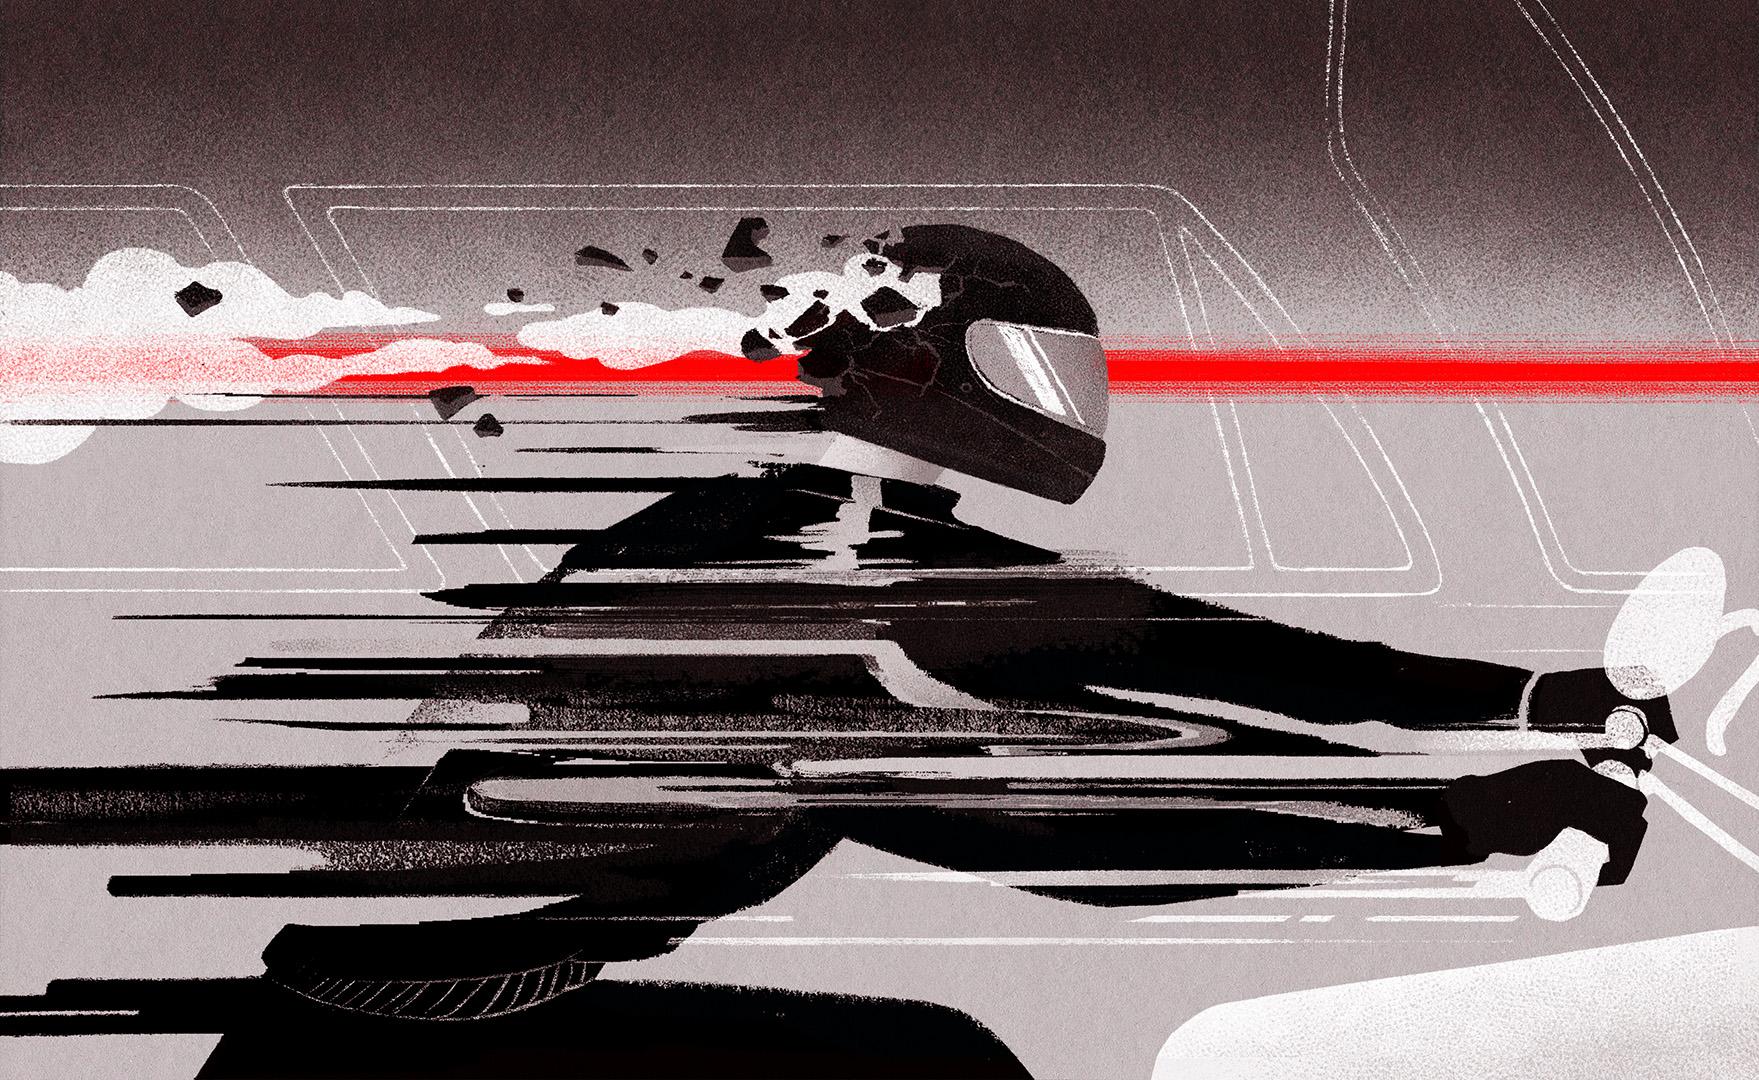 "JALOPNIK, <a href=""http://blackflag.jalopnik.com/what-a-race-car-crash-does-to-your-brain-1778499867"" target=""_blank"">What A Race Car Crash Does To Your Brain</a>"